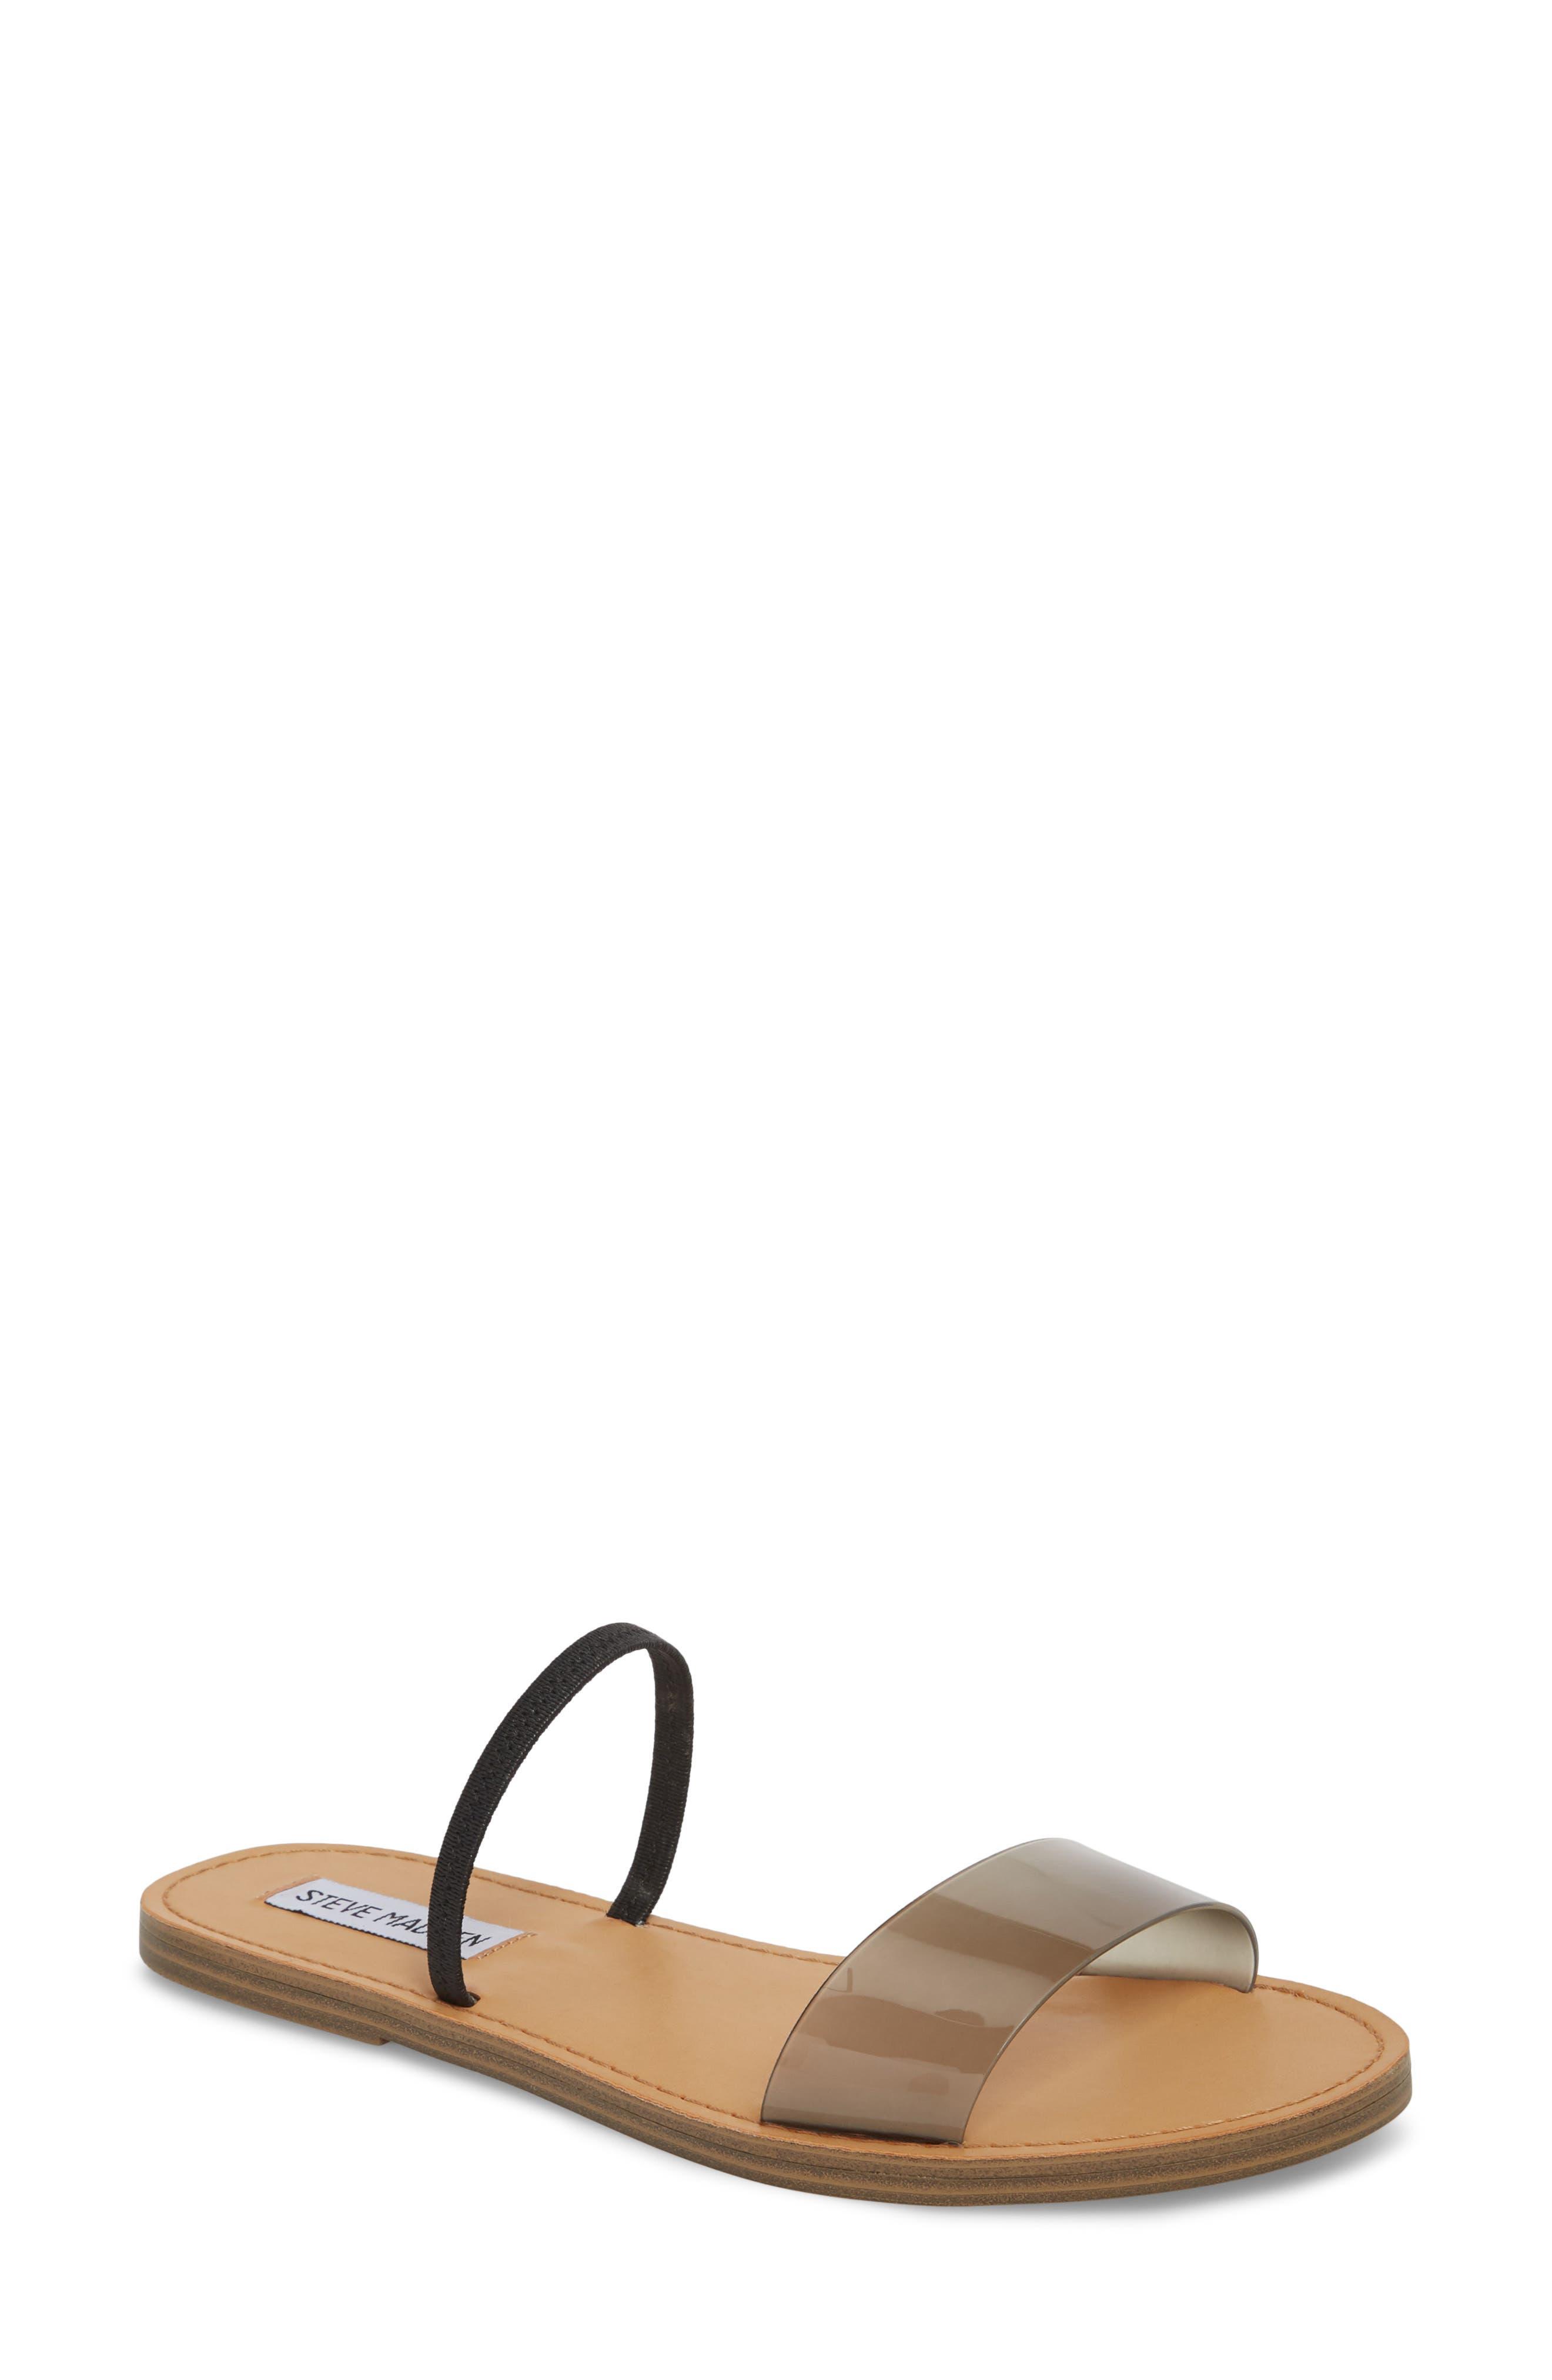 Dasha Strappy Slide Sandal,                             Main thumbnail 1, color,                             Smoke